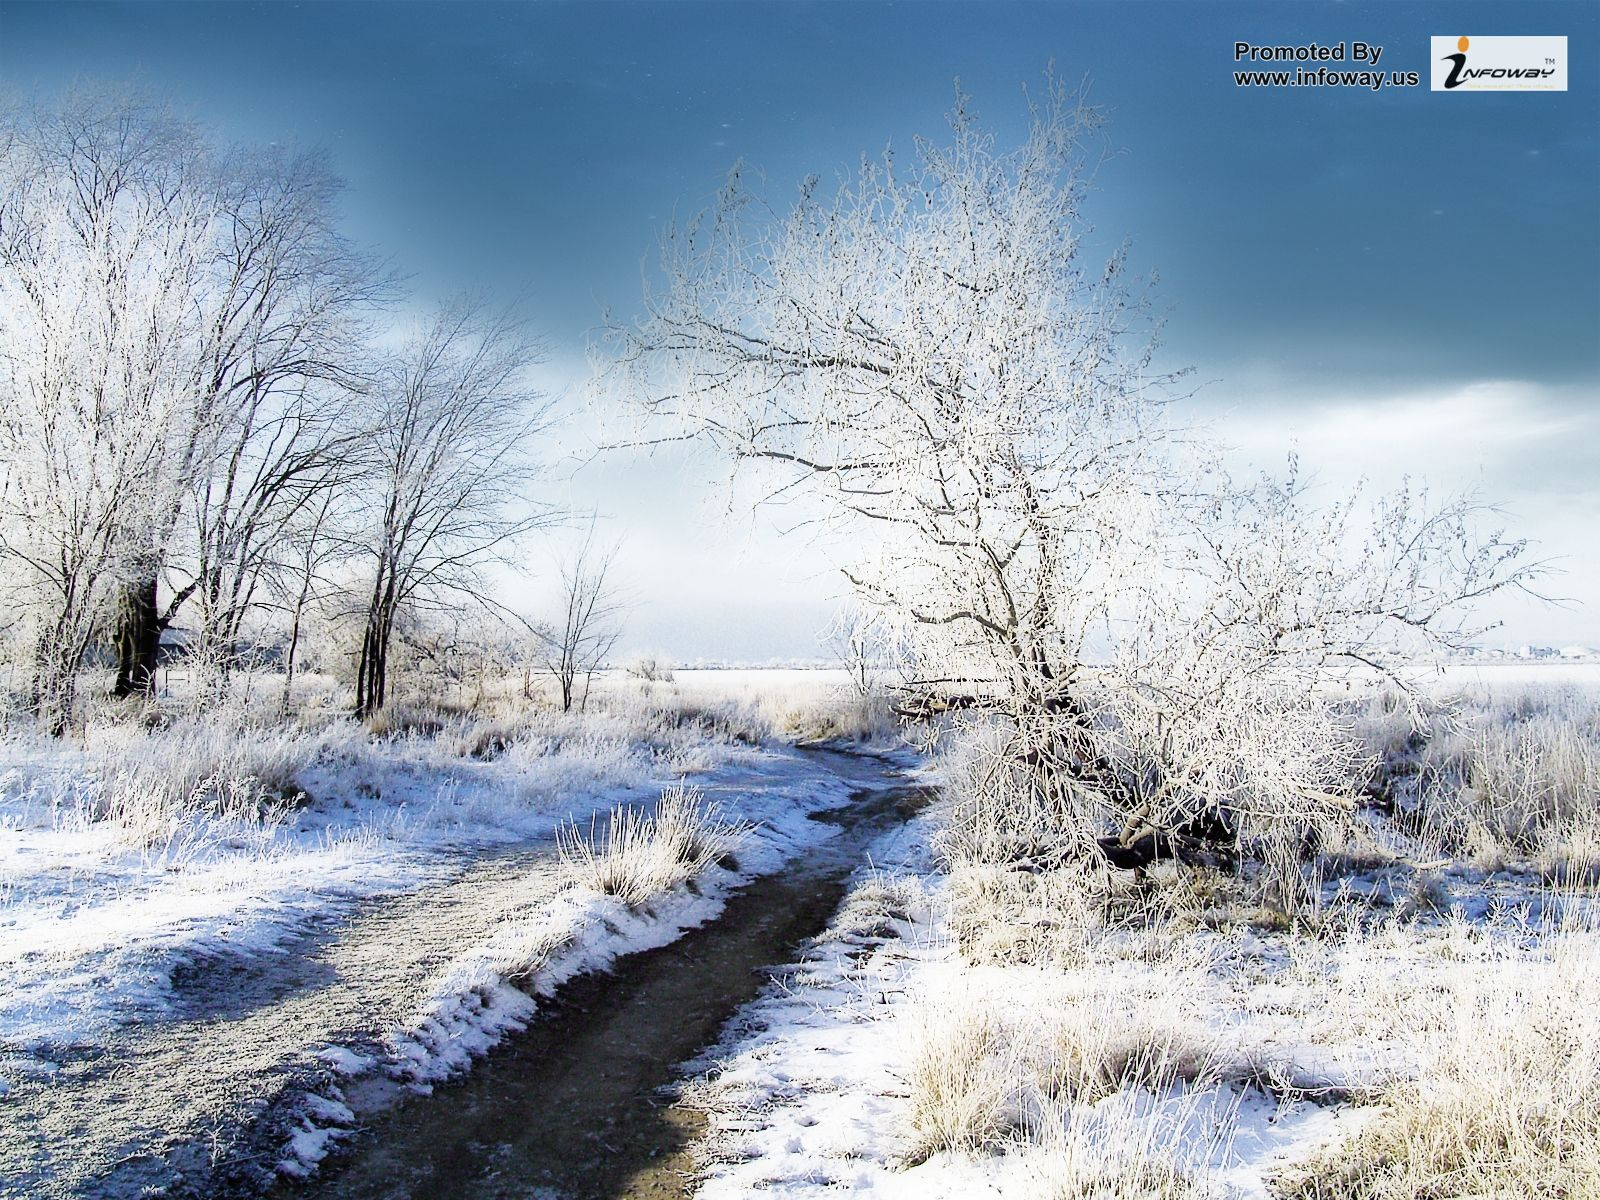 46 Country Winter Wallpaper For Desktop On Wallpapersafari